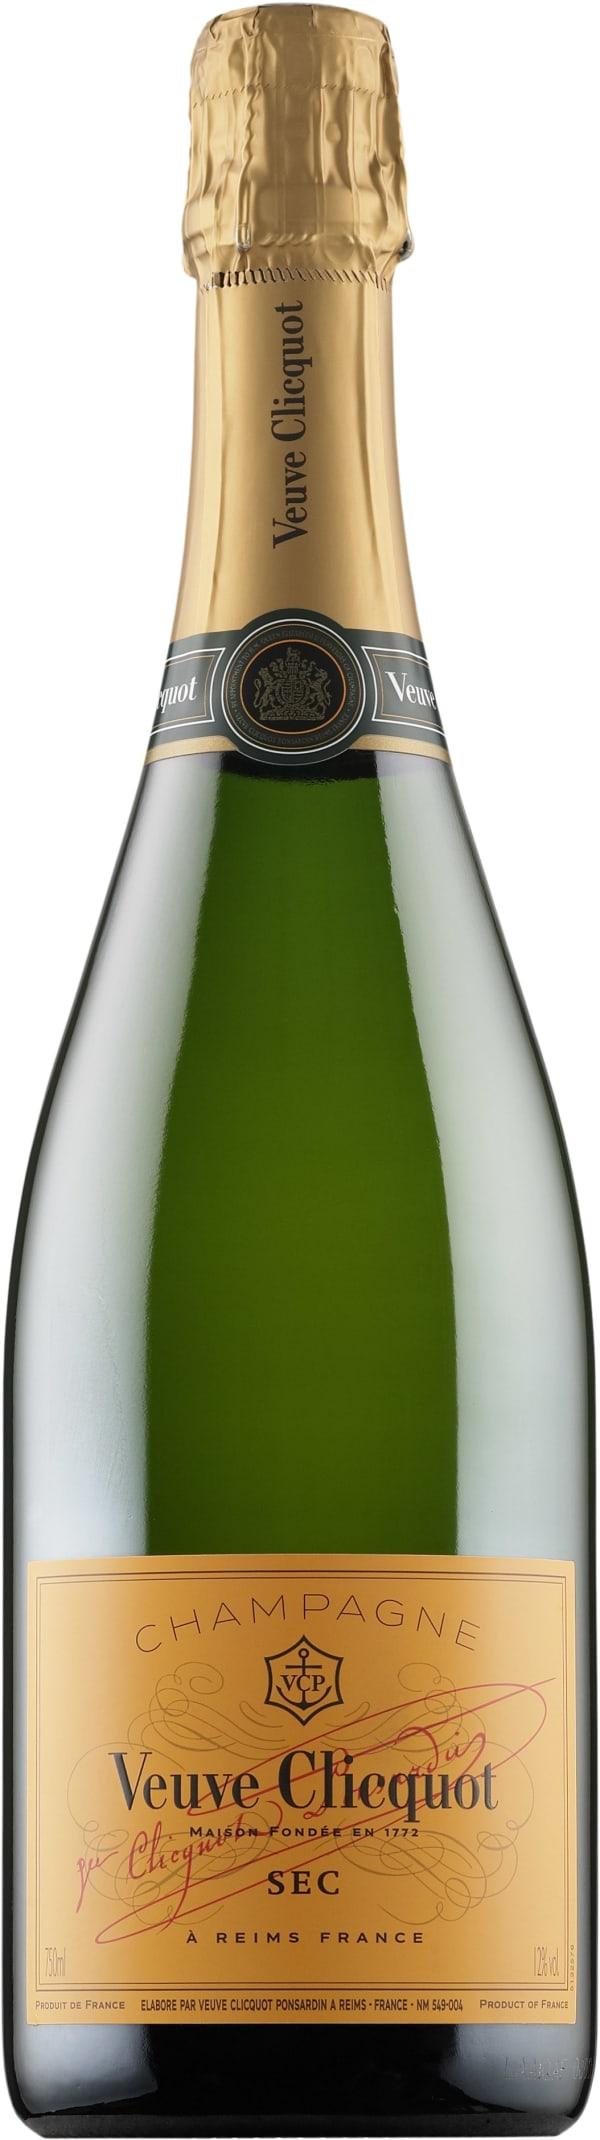 Veuve Clicquot Champagne Sec